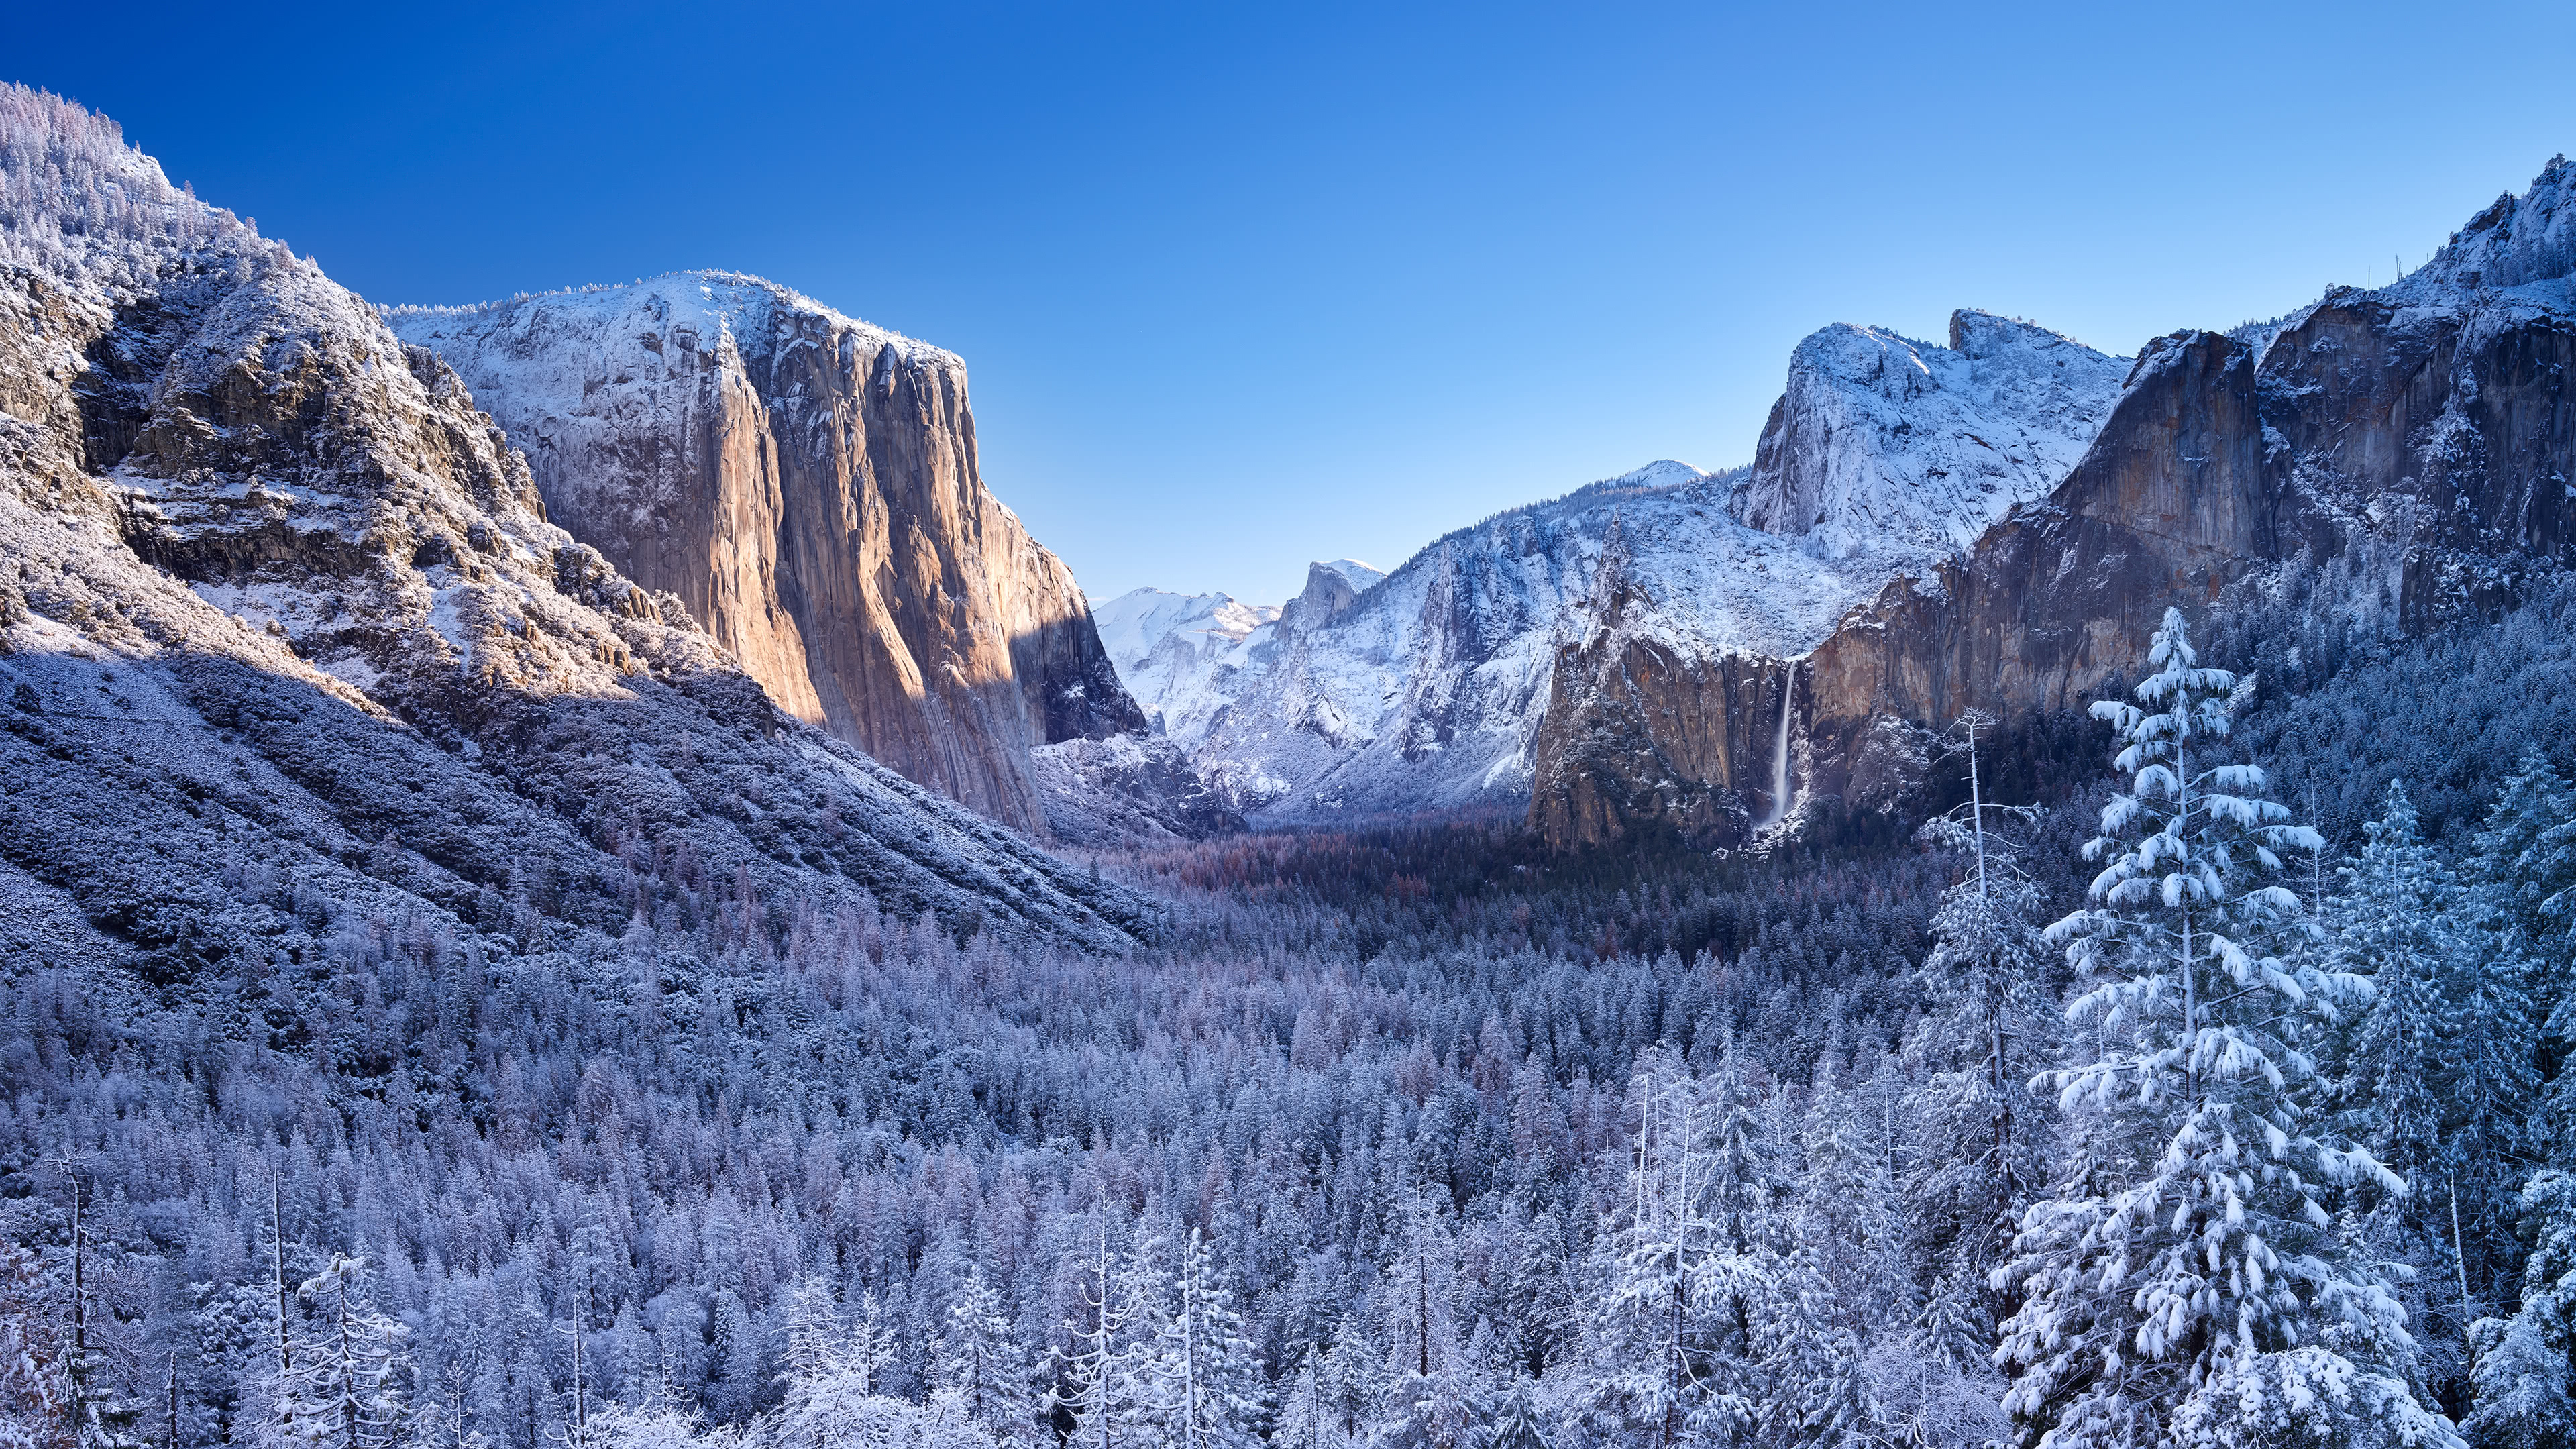 el capitan rock formation winter yosemite national park california united states 4k wallpaper